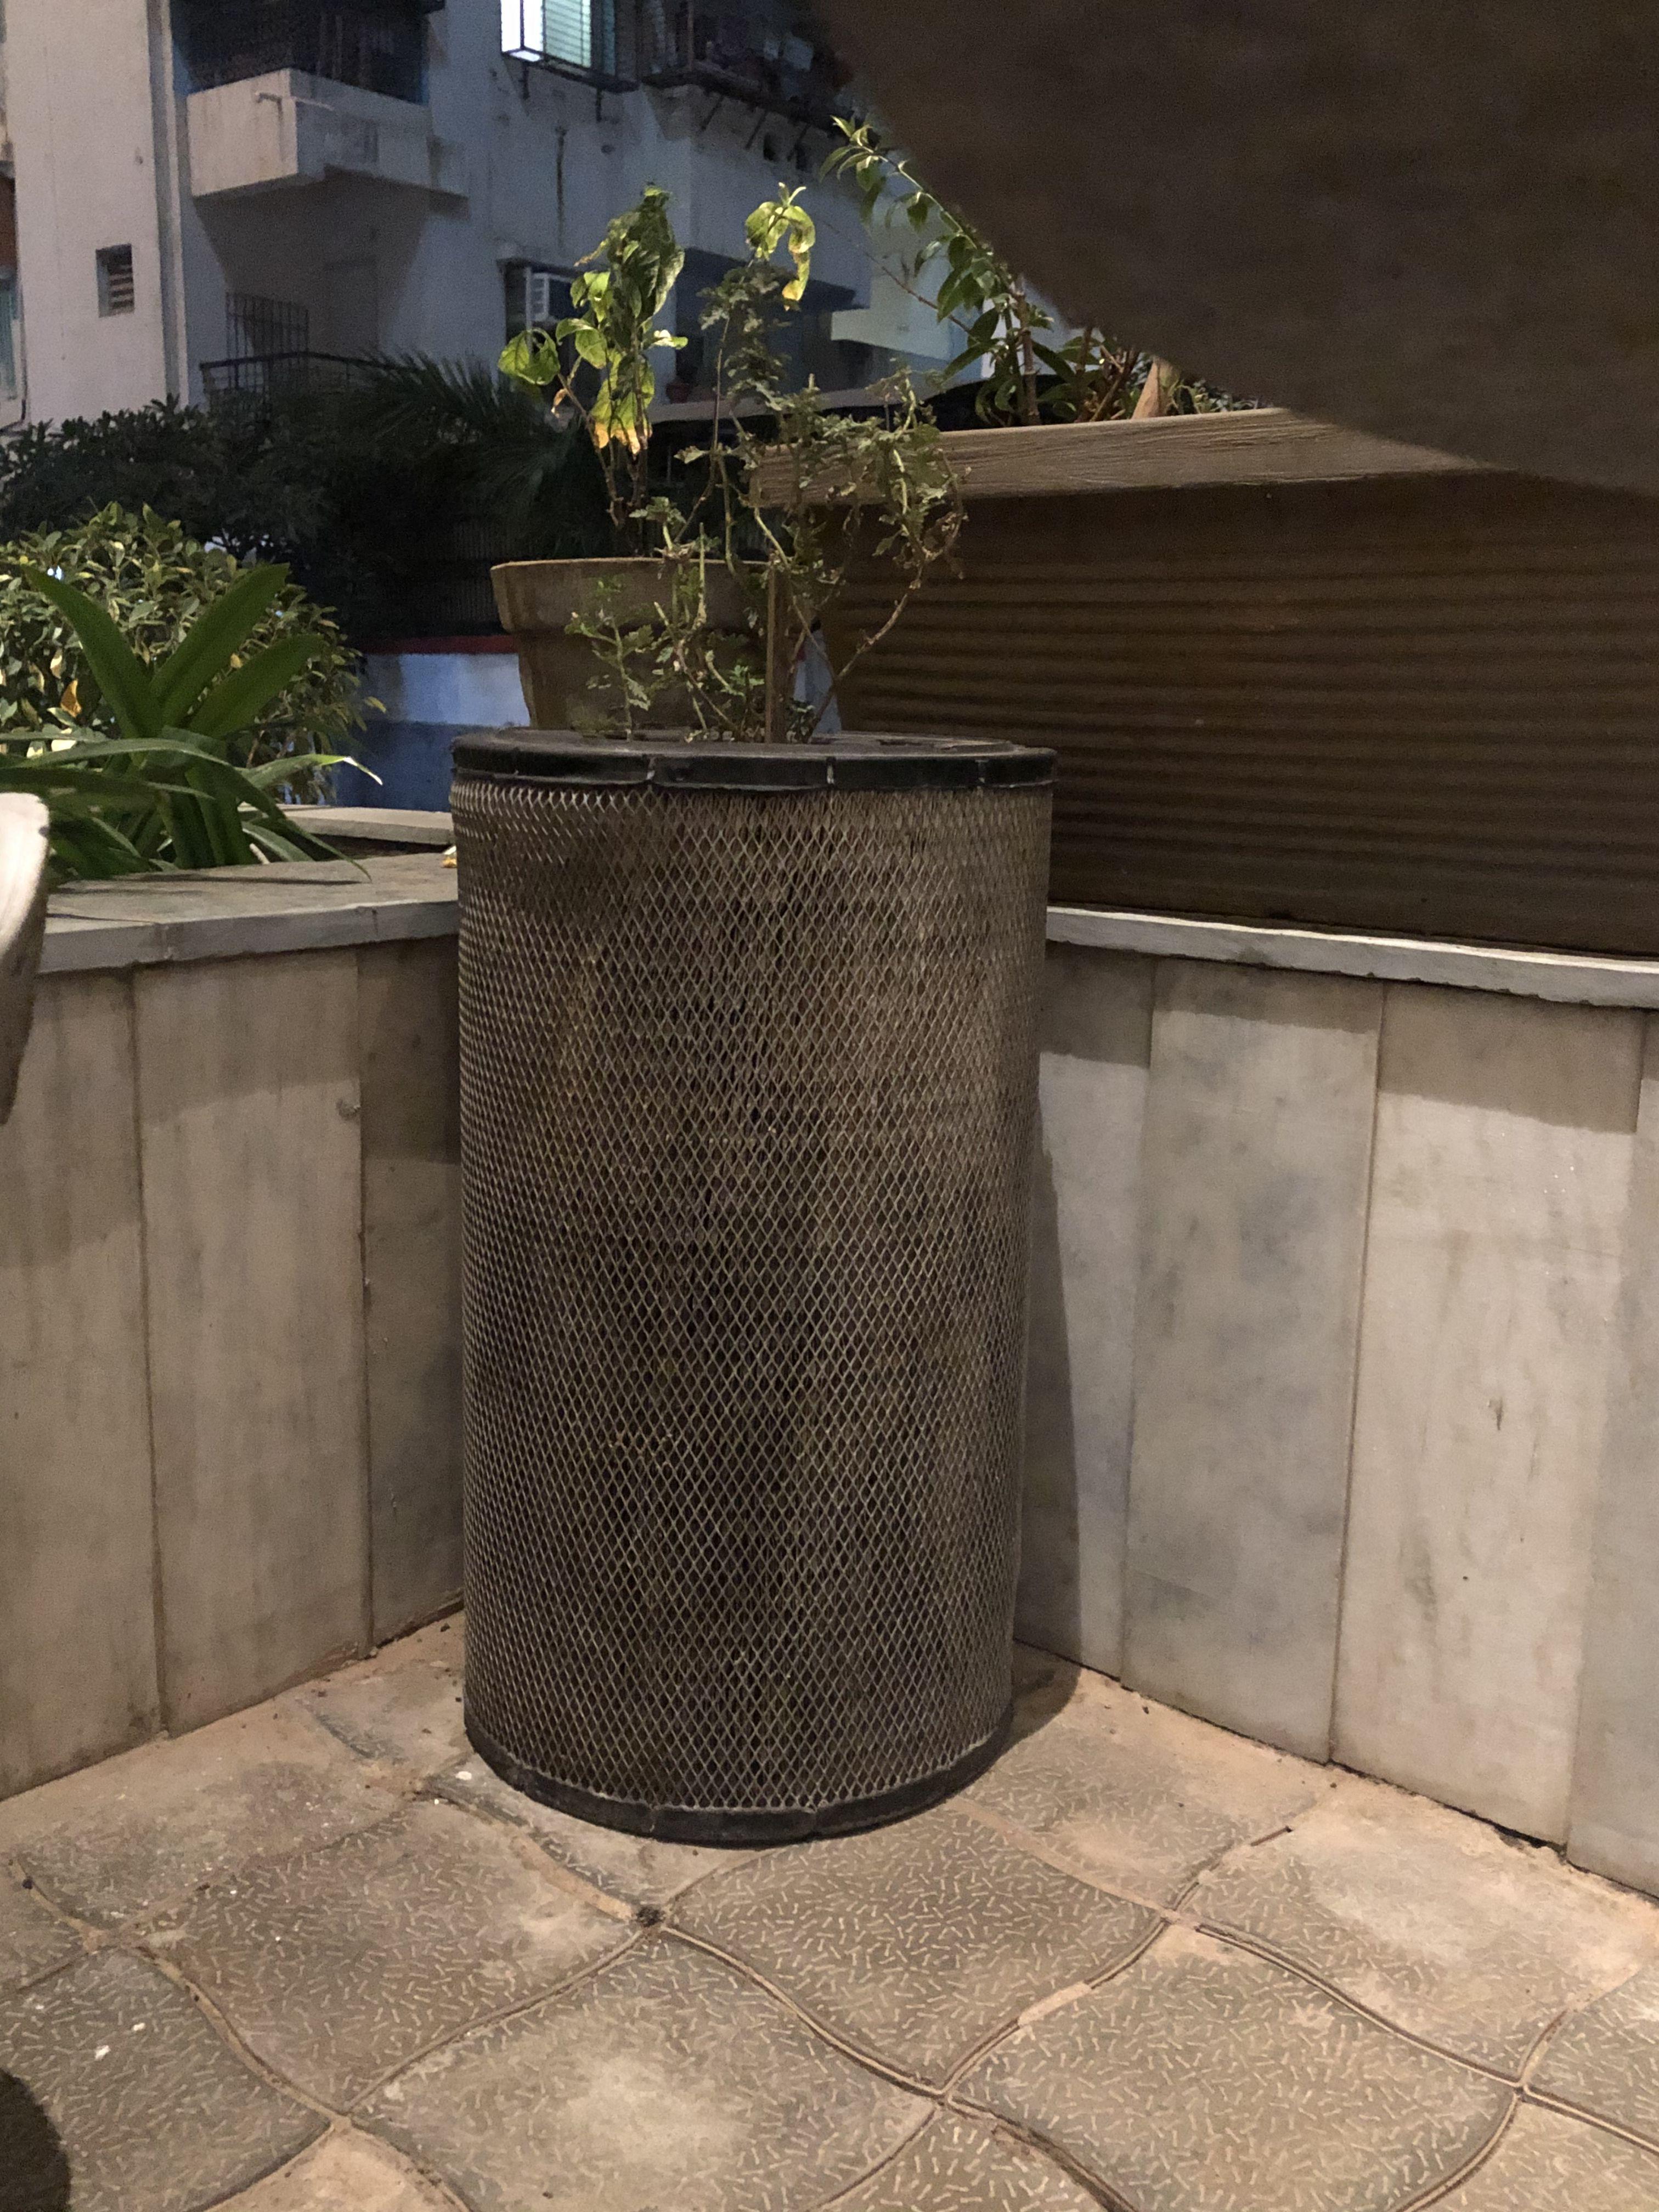 Planting Ideas | Air filter, Plants, Flower pots